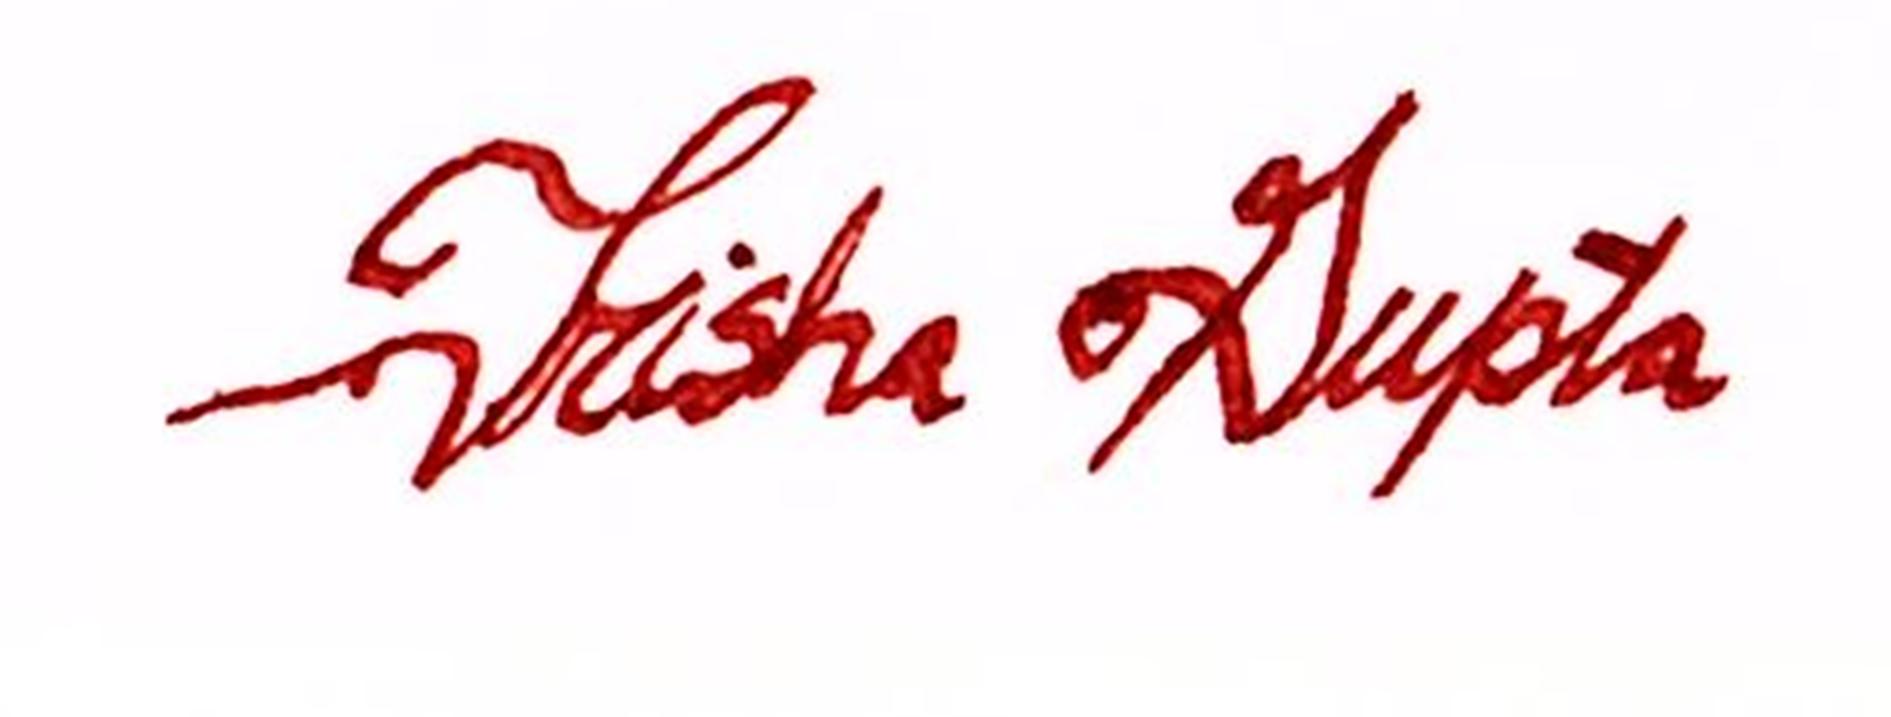 Trisha Gupta's Signature